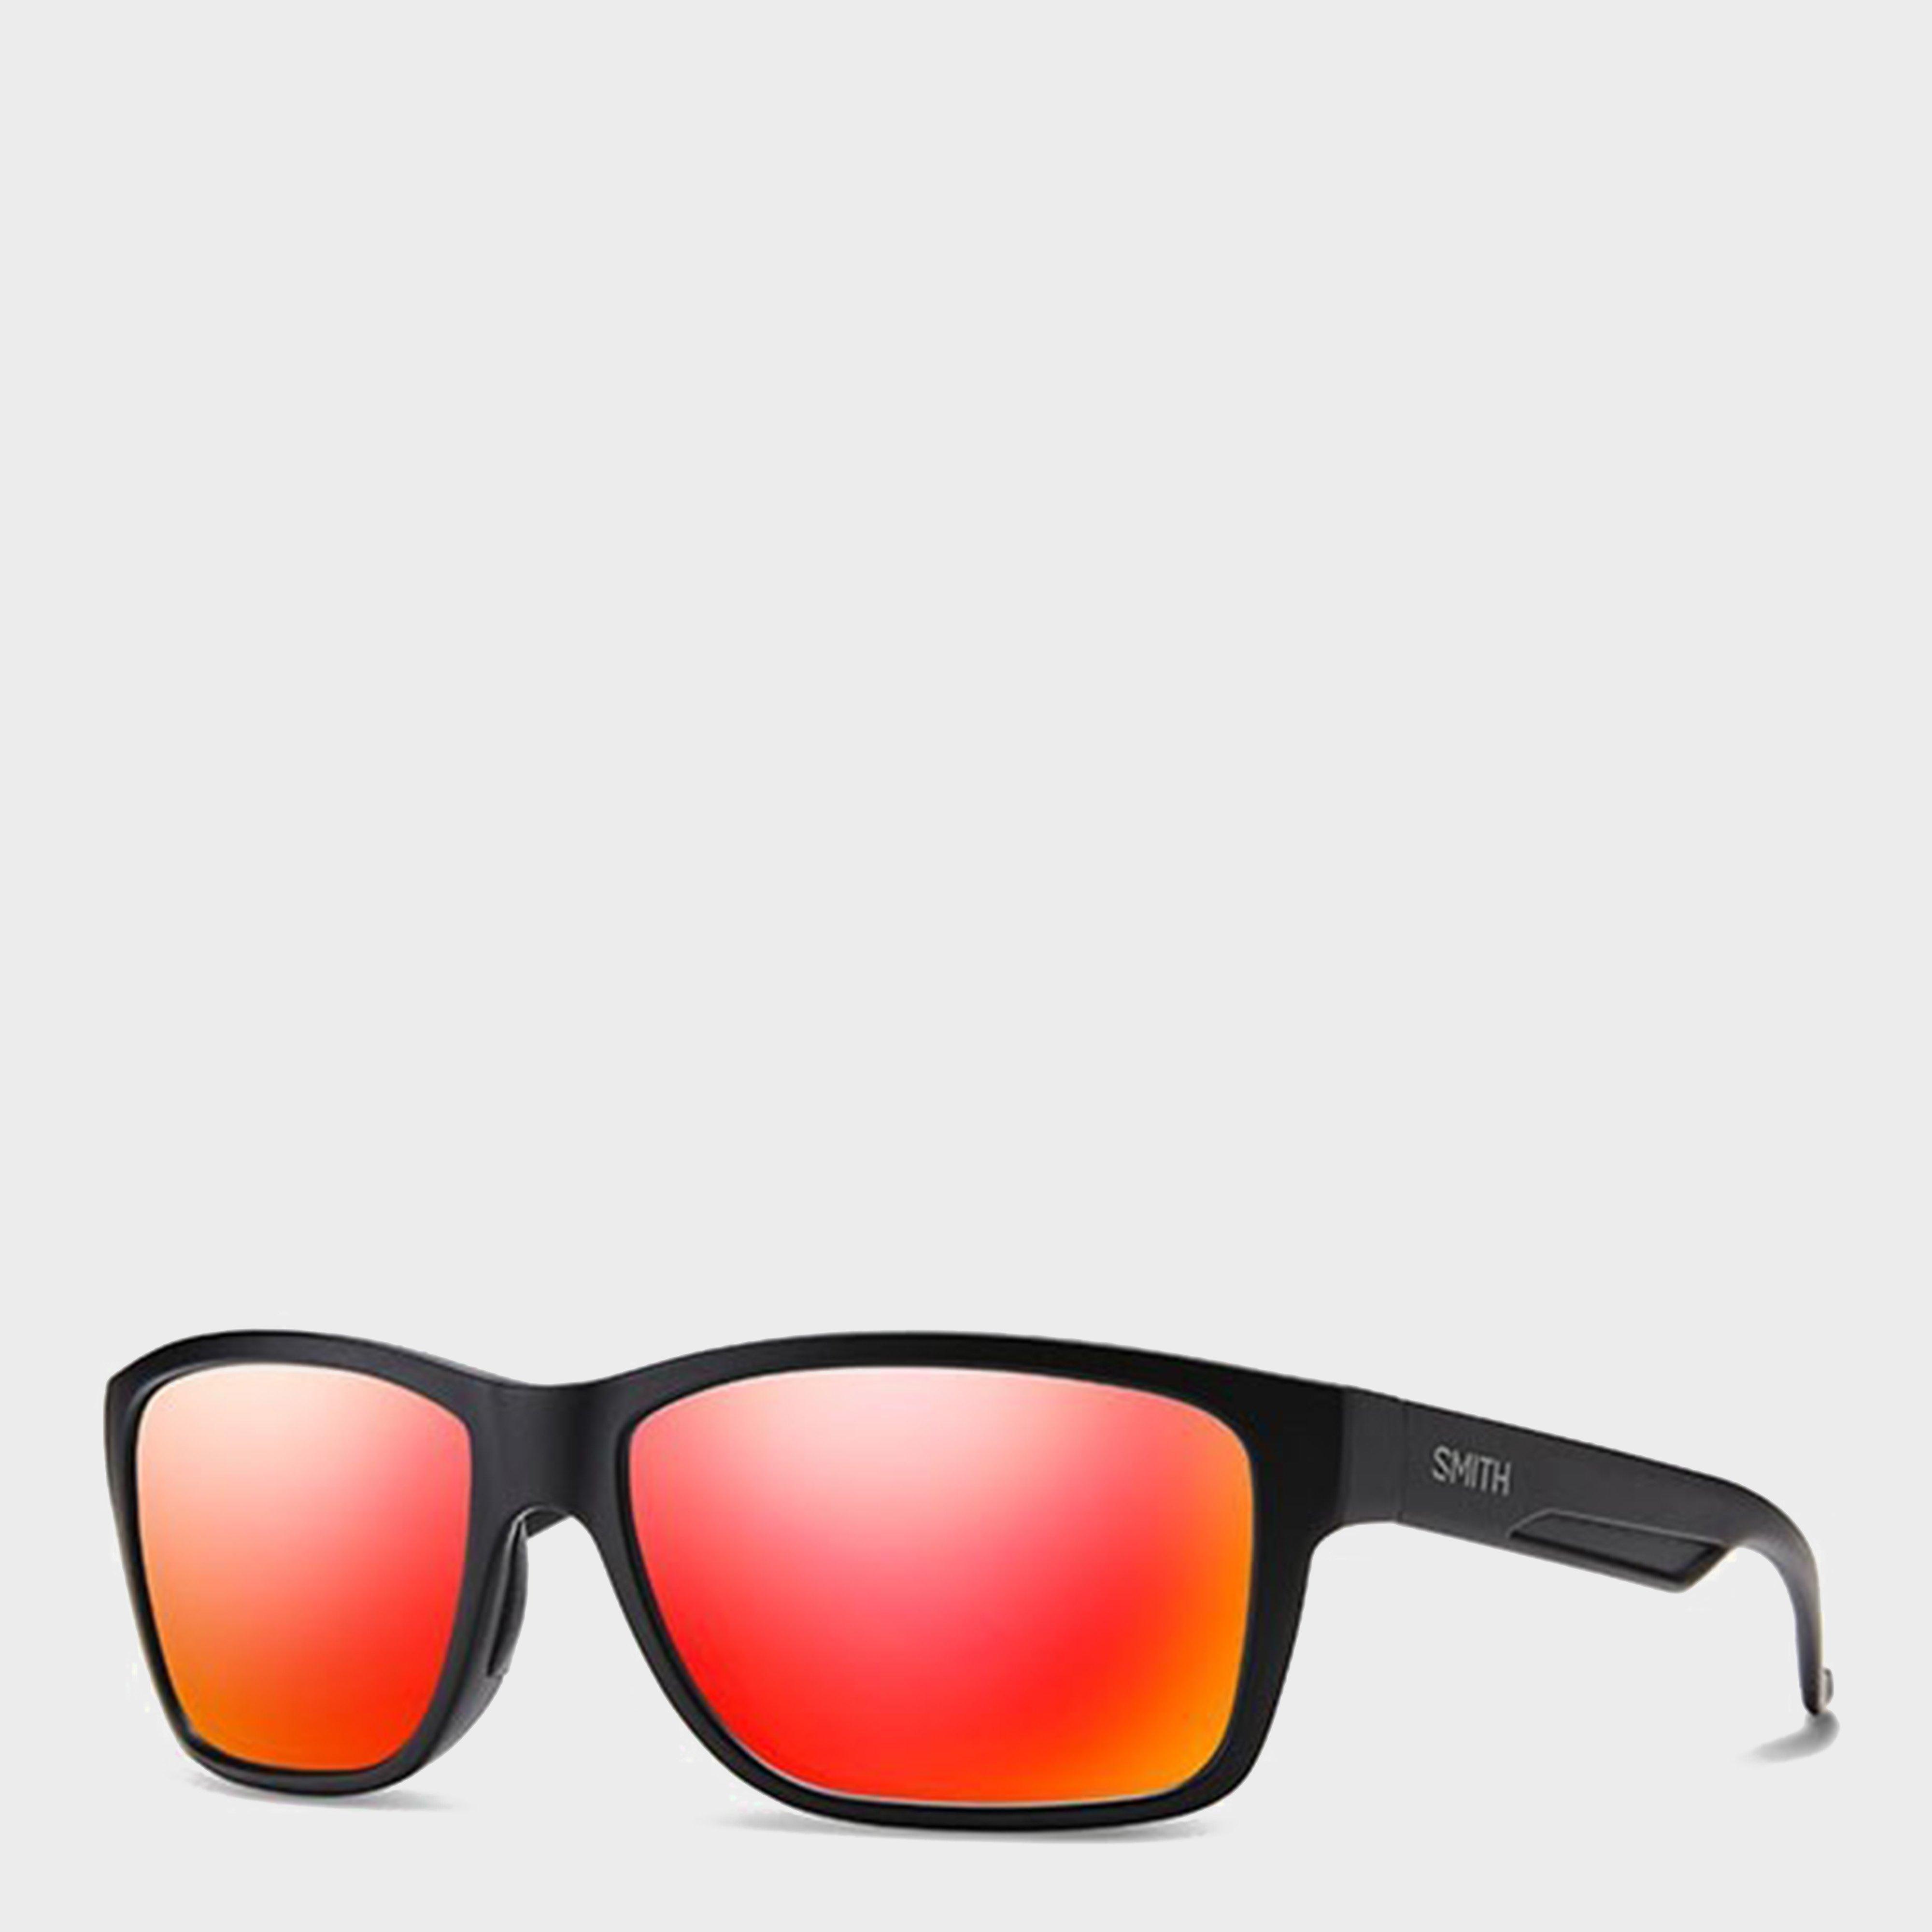 Smith Men's Harbour Sunglasses, Red